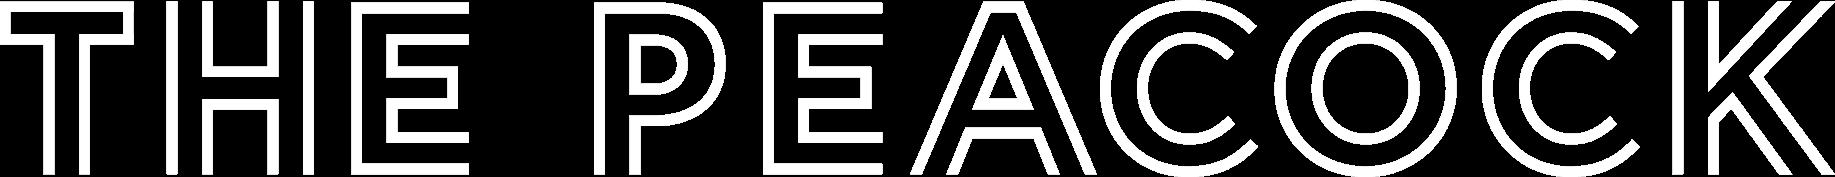 peacock-logo-white-transparent.png